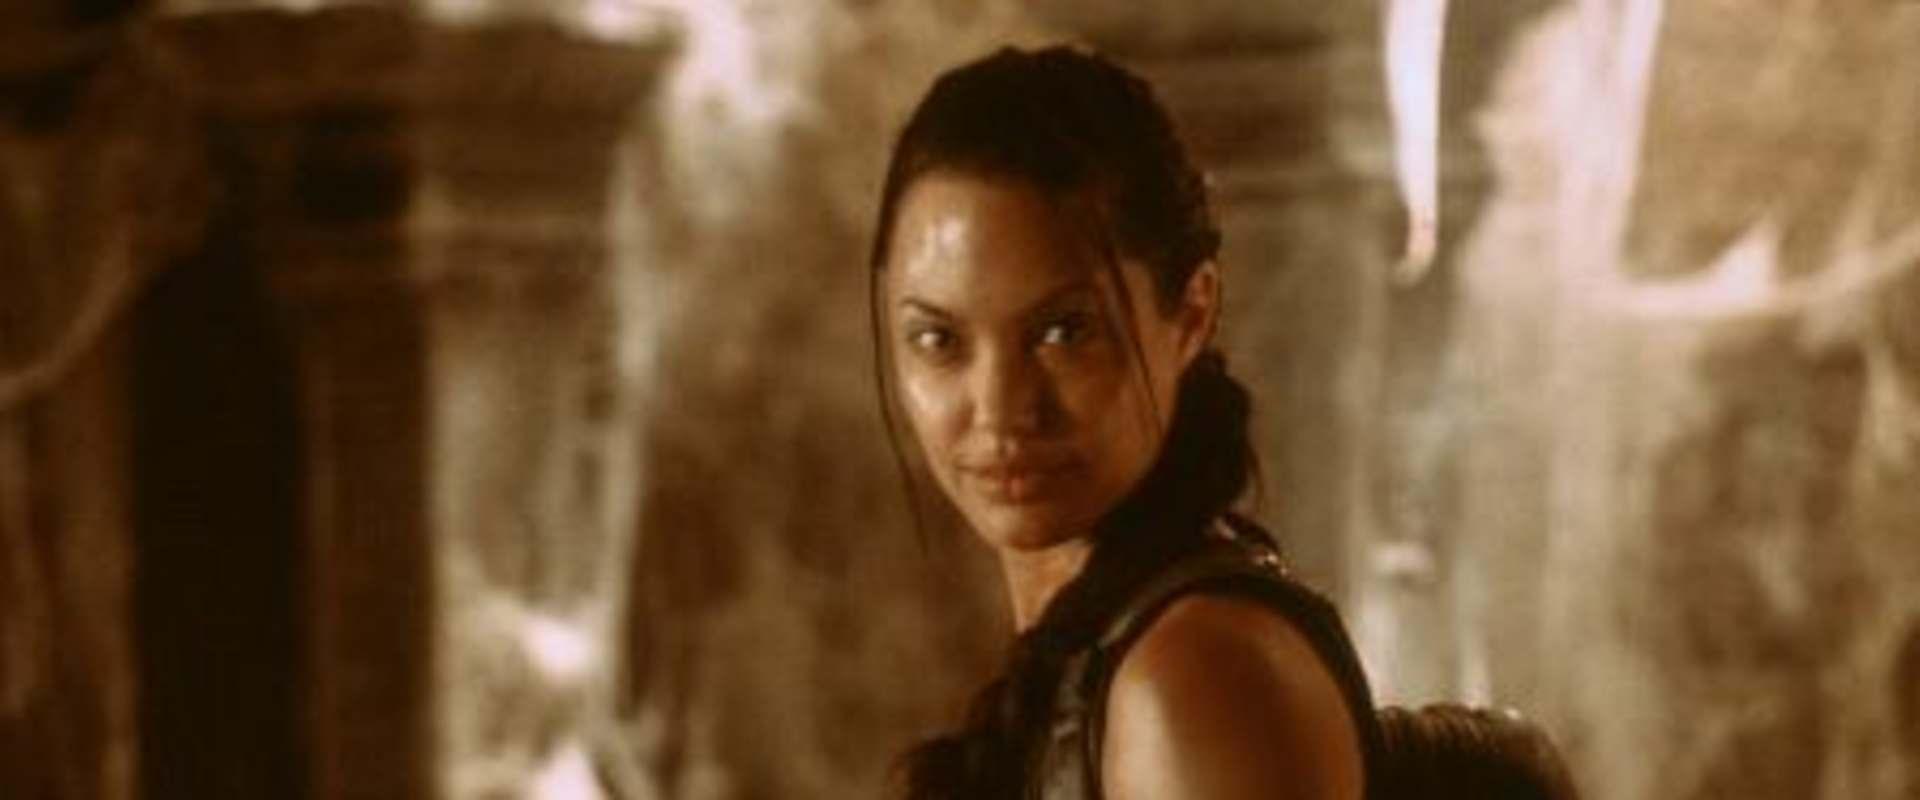 Watch Lara Croft Tomb Raider On Netflix Today Netflixmovies Com